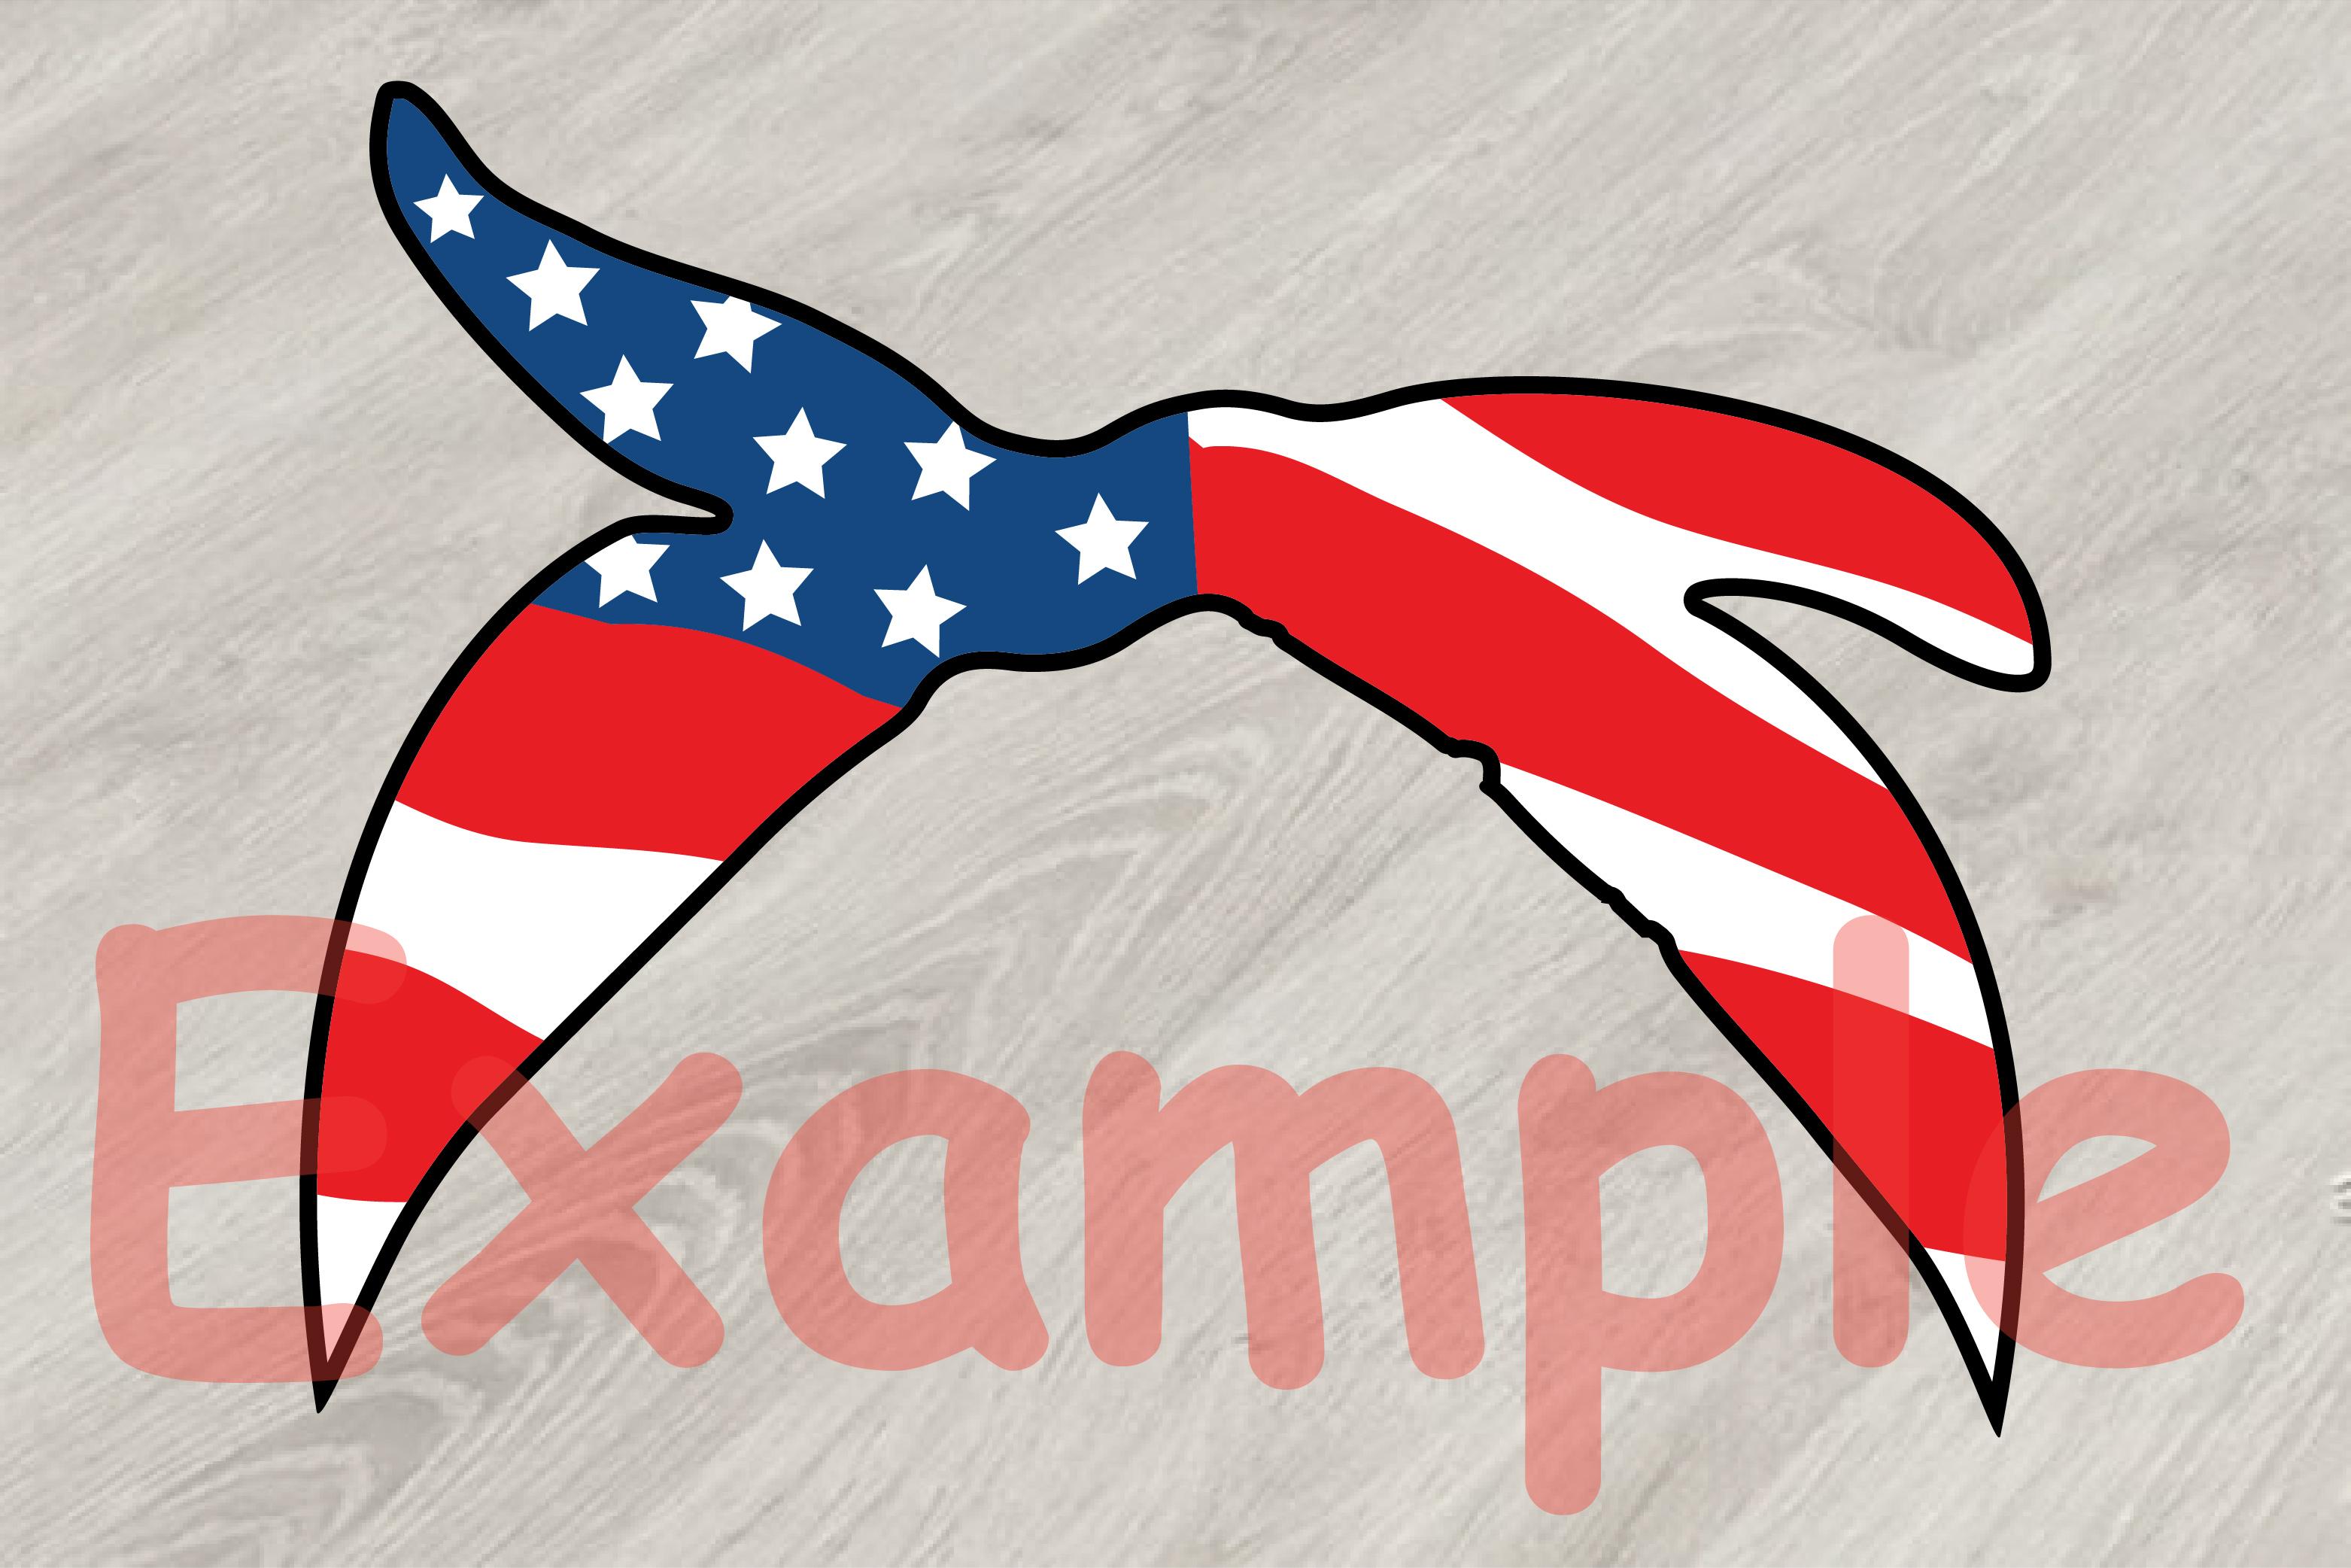 3125x2084 Cow Usa Flag Bandana Silhouette Svg Cut Design Bundles